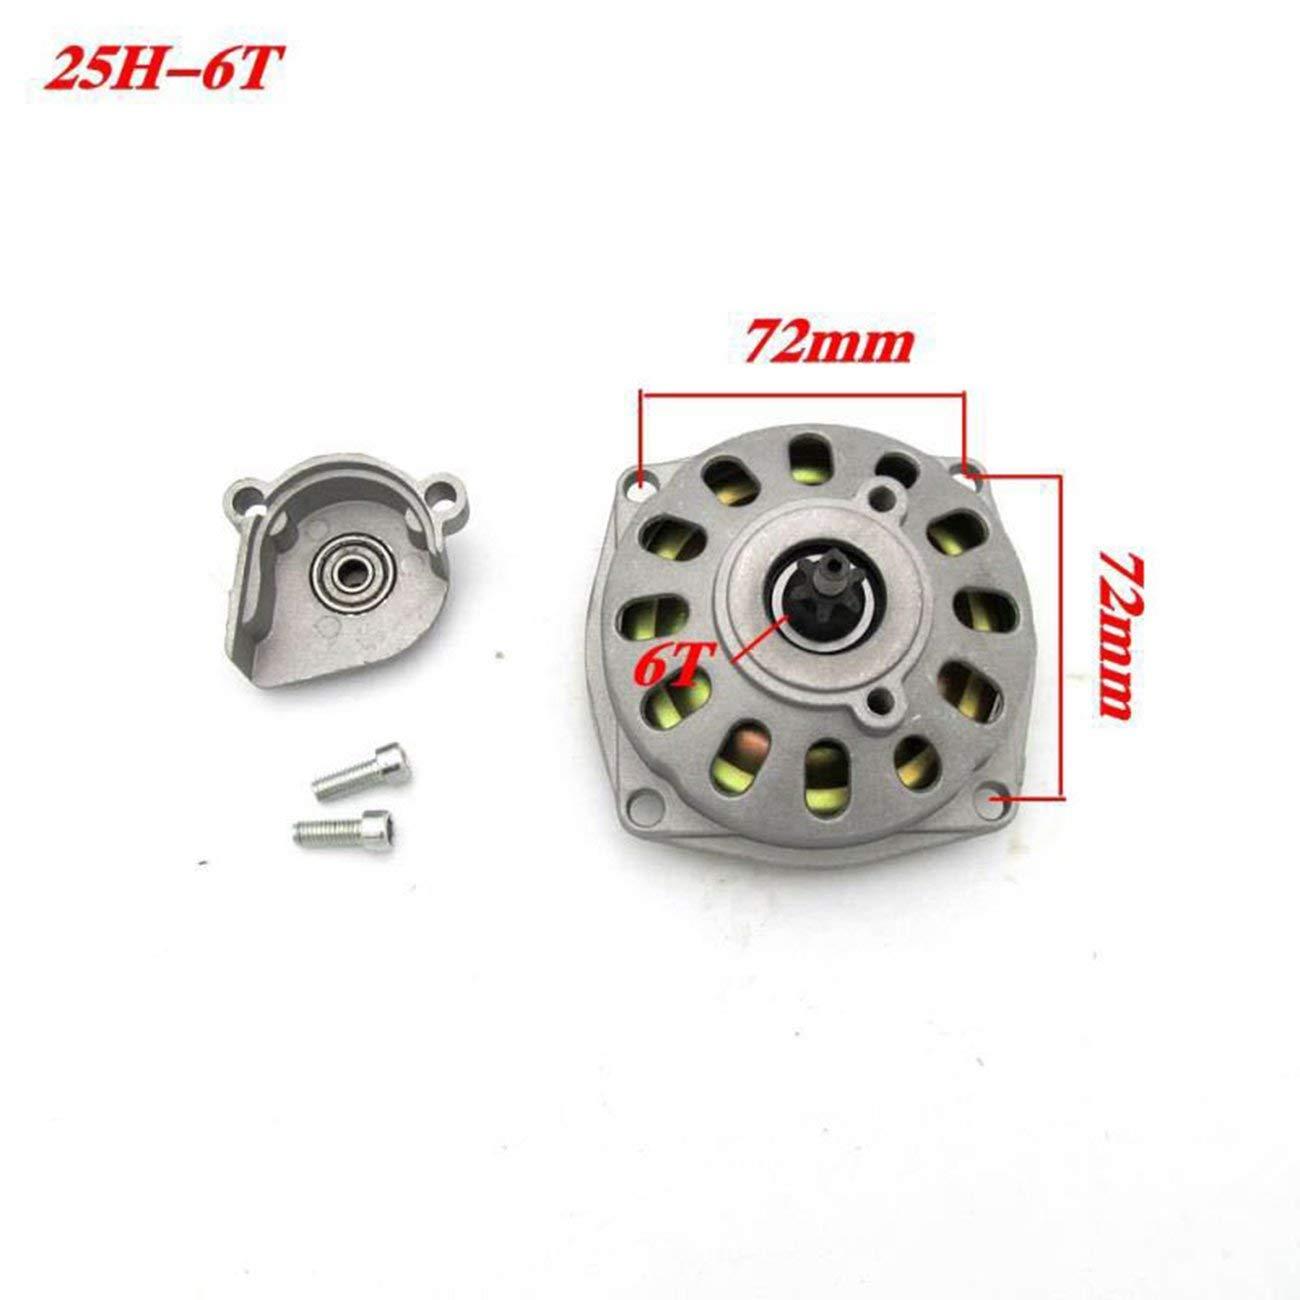 Fannty 47cc 49cc 25H 6 dientes Embrague Tambor Caja de engranajes 2 tiempos Mini bicicleta ATV Quad